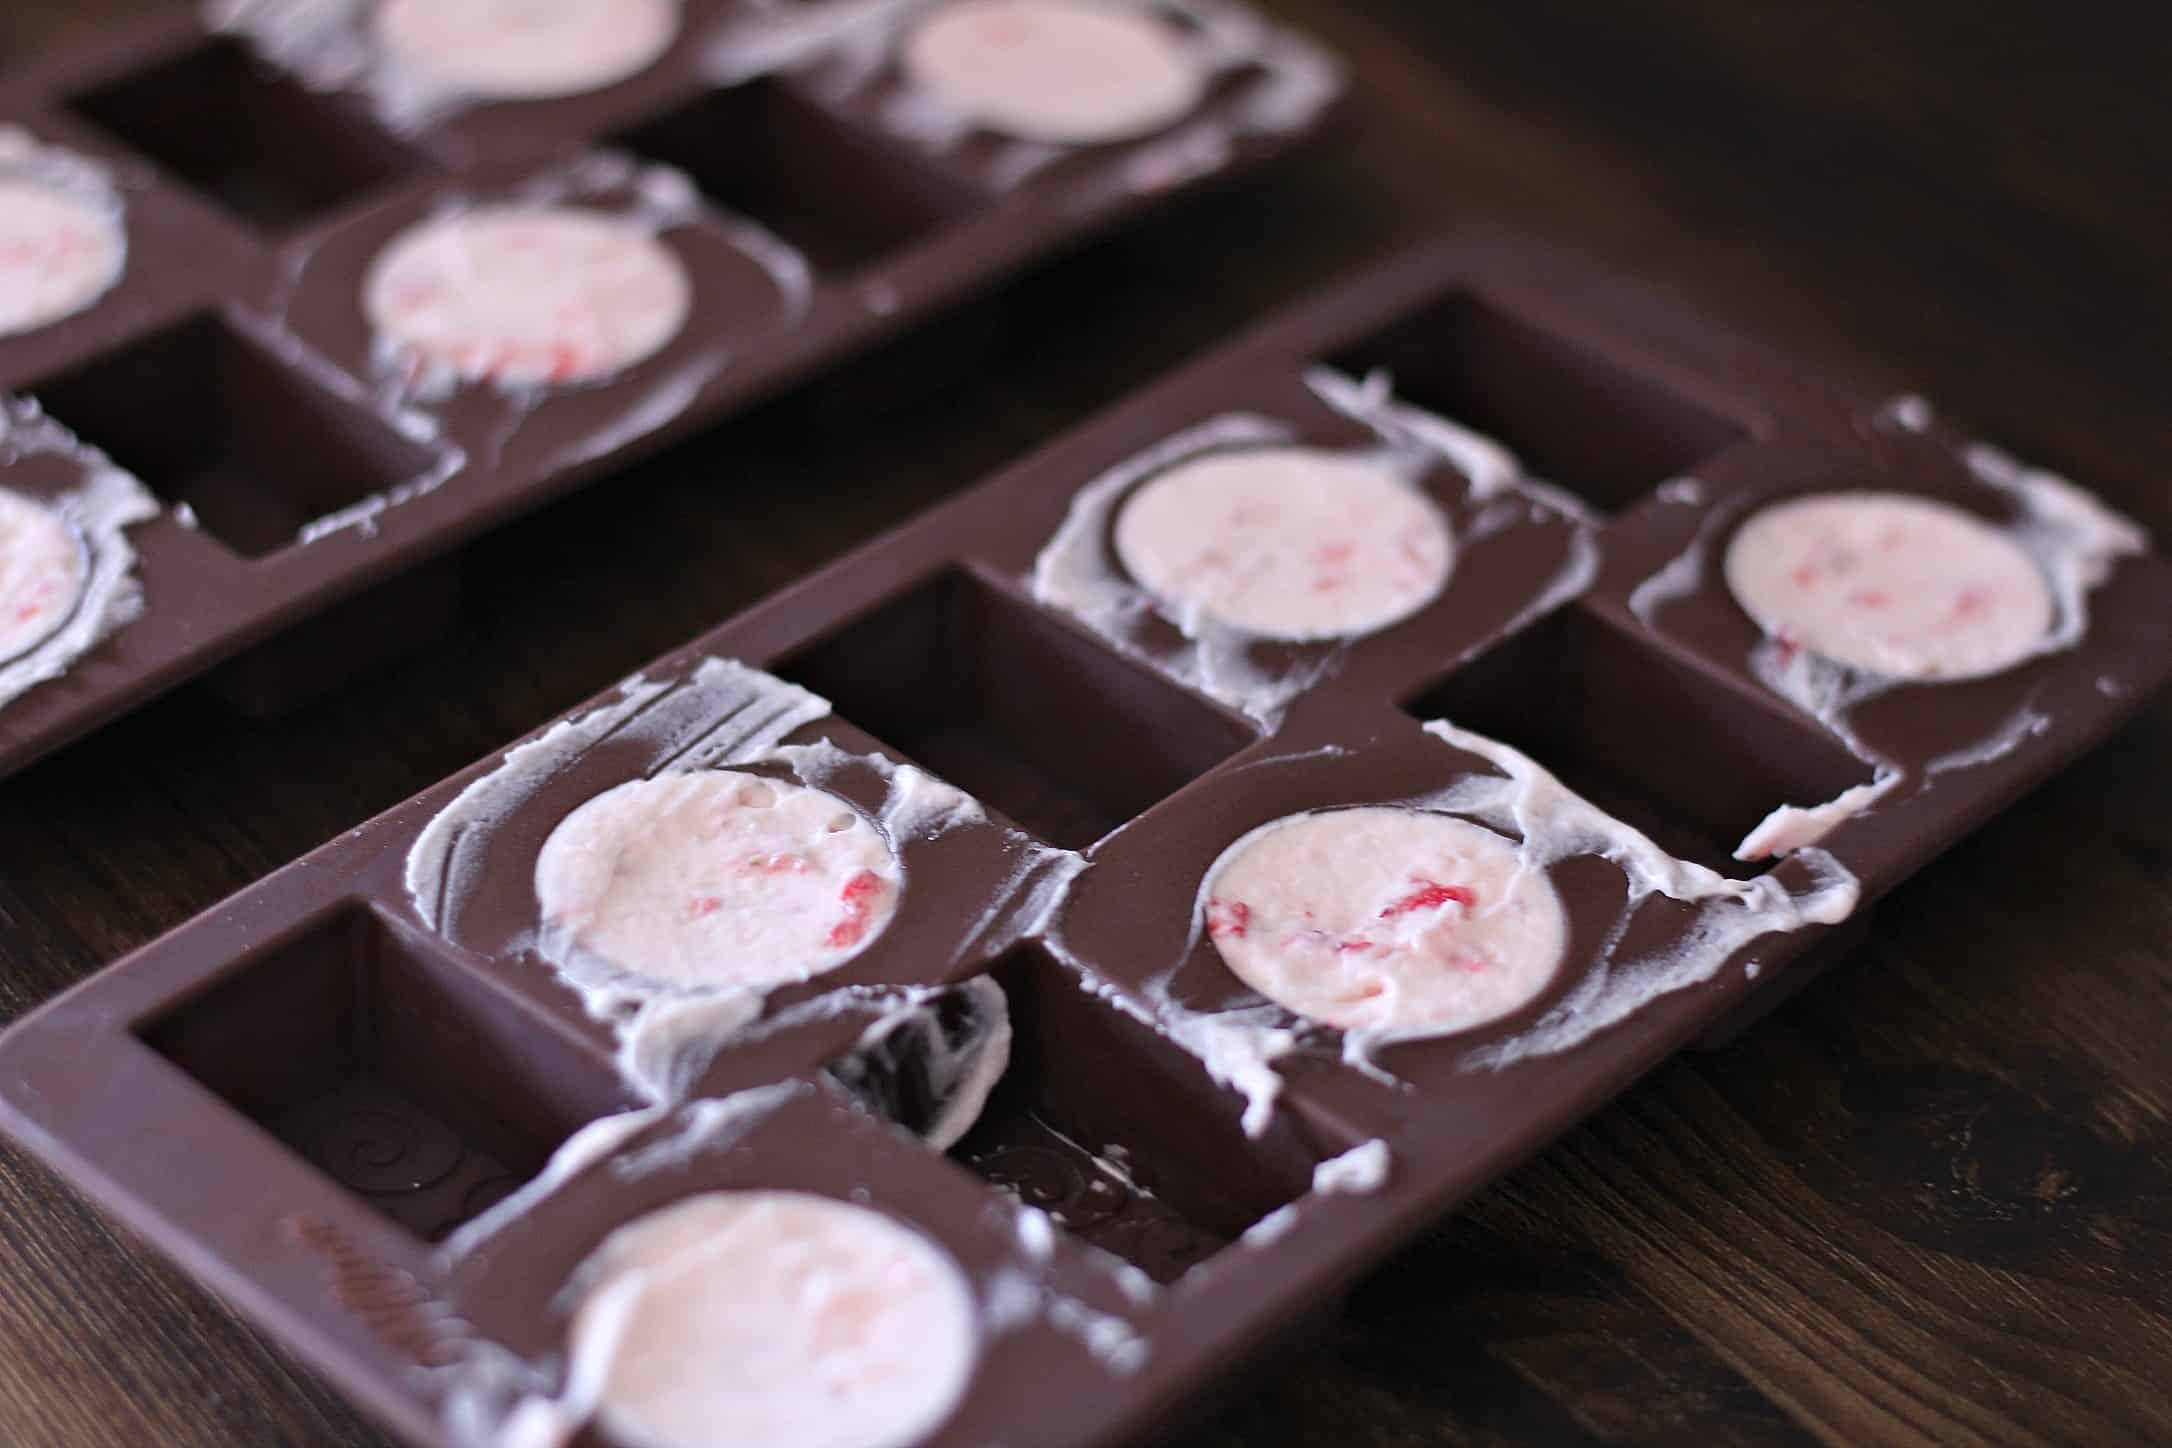 chocolate strawberry fat Bomb